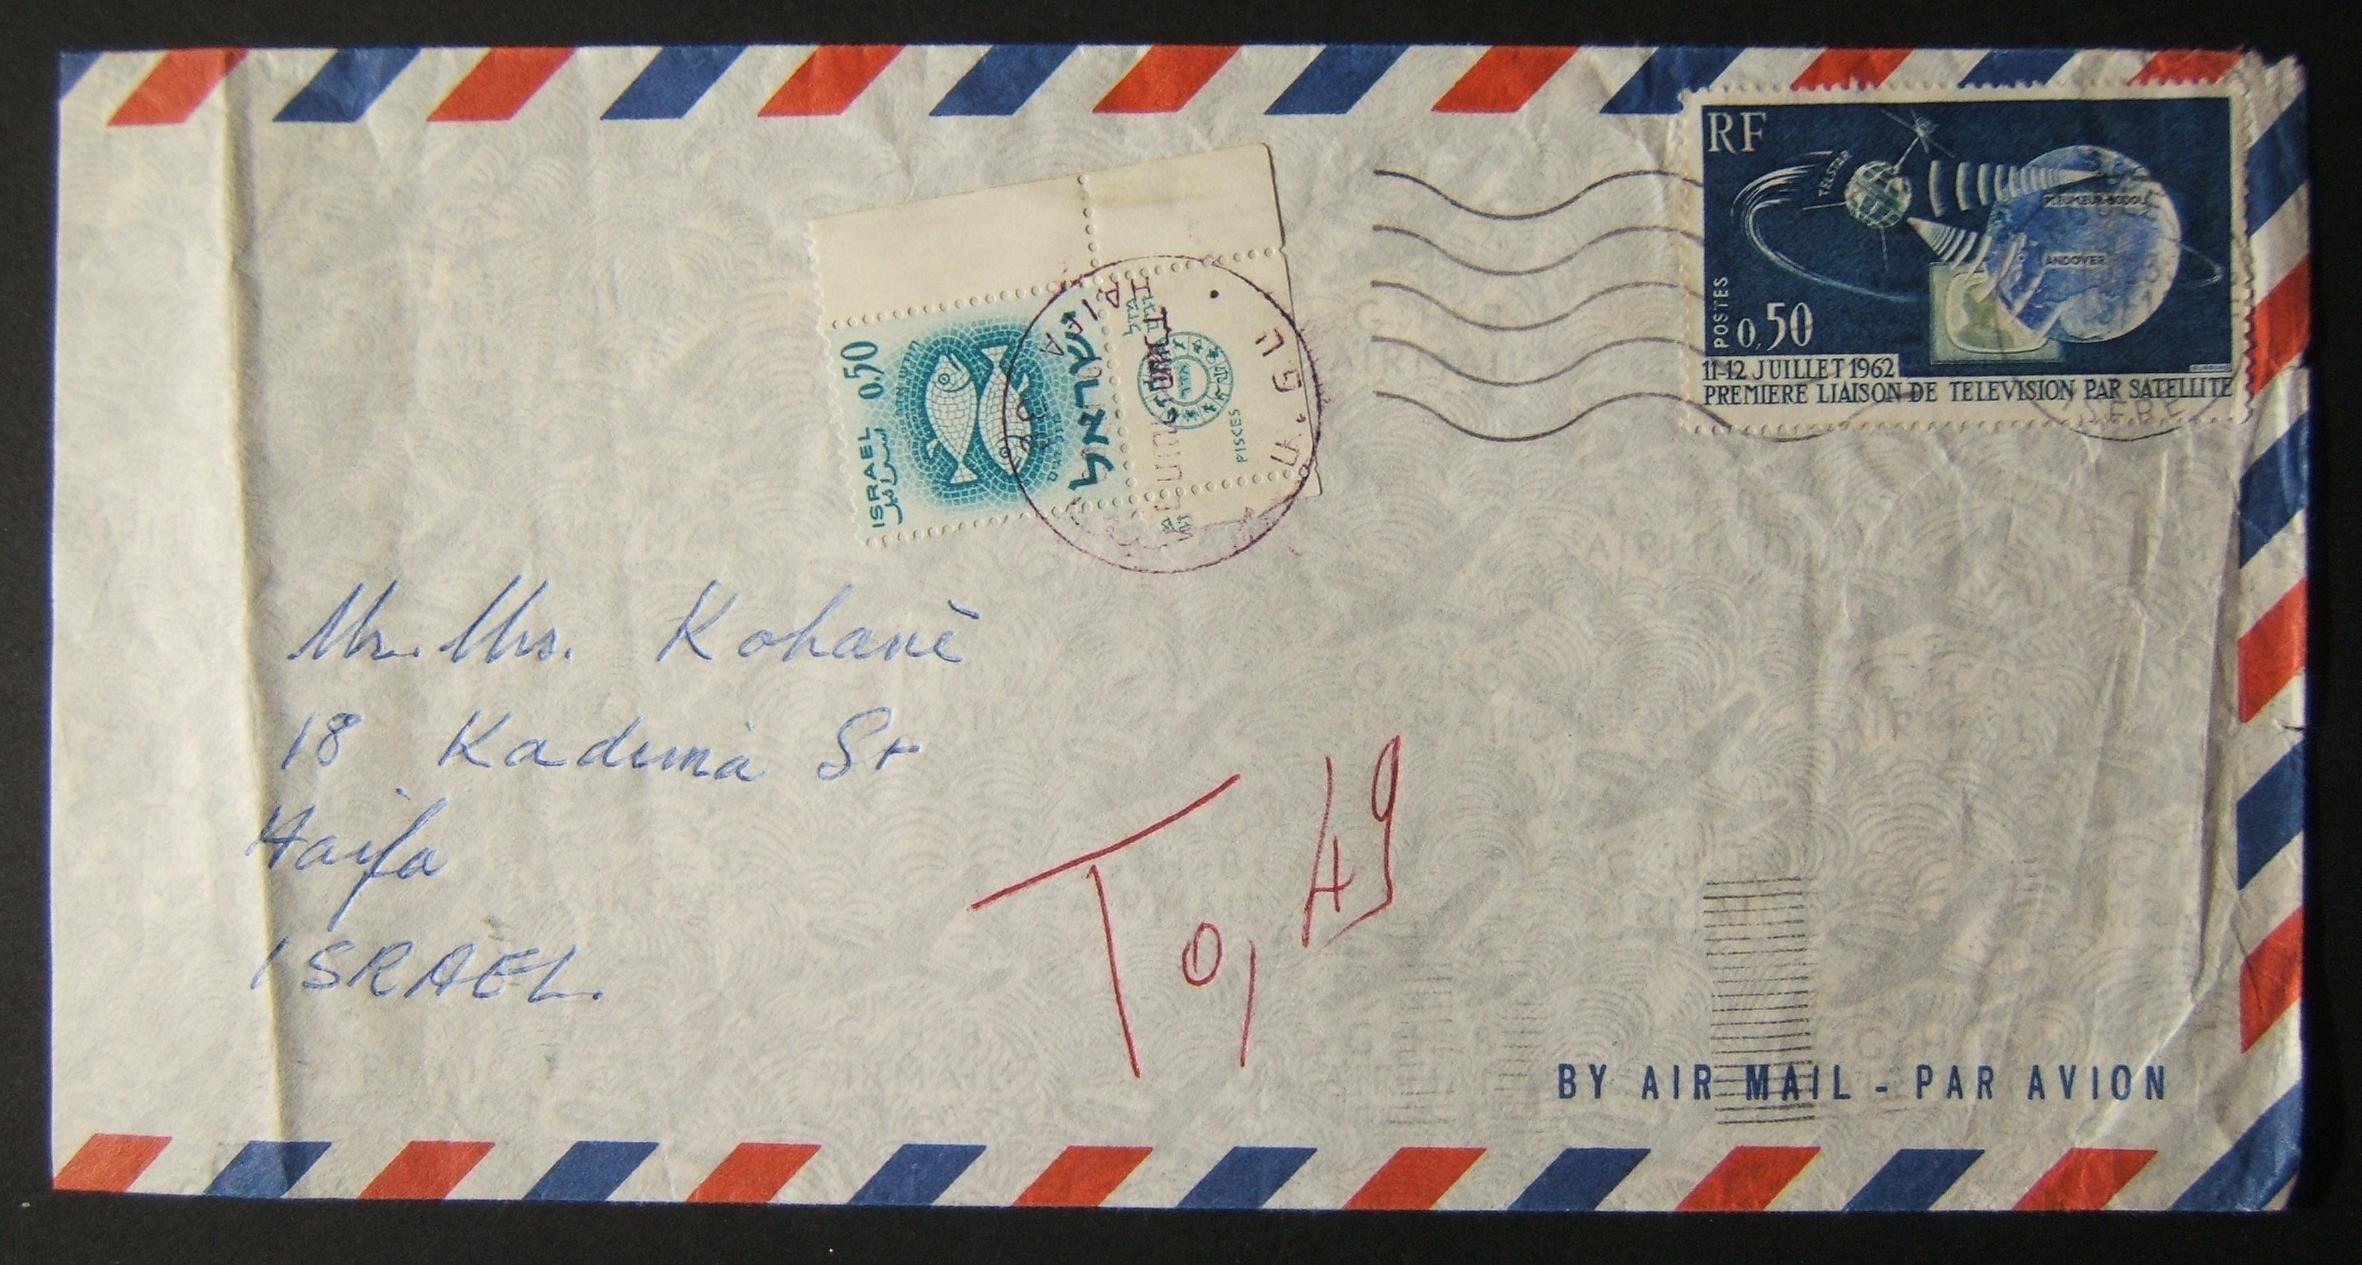 10/1963 underfranked דואר אוויר צרפתי מסים עם חותמת עם חותמת אדומה חותמת דואר אדום